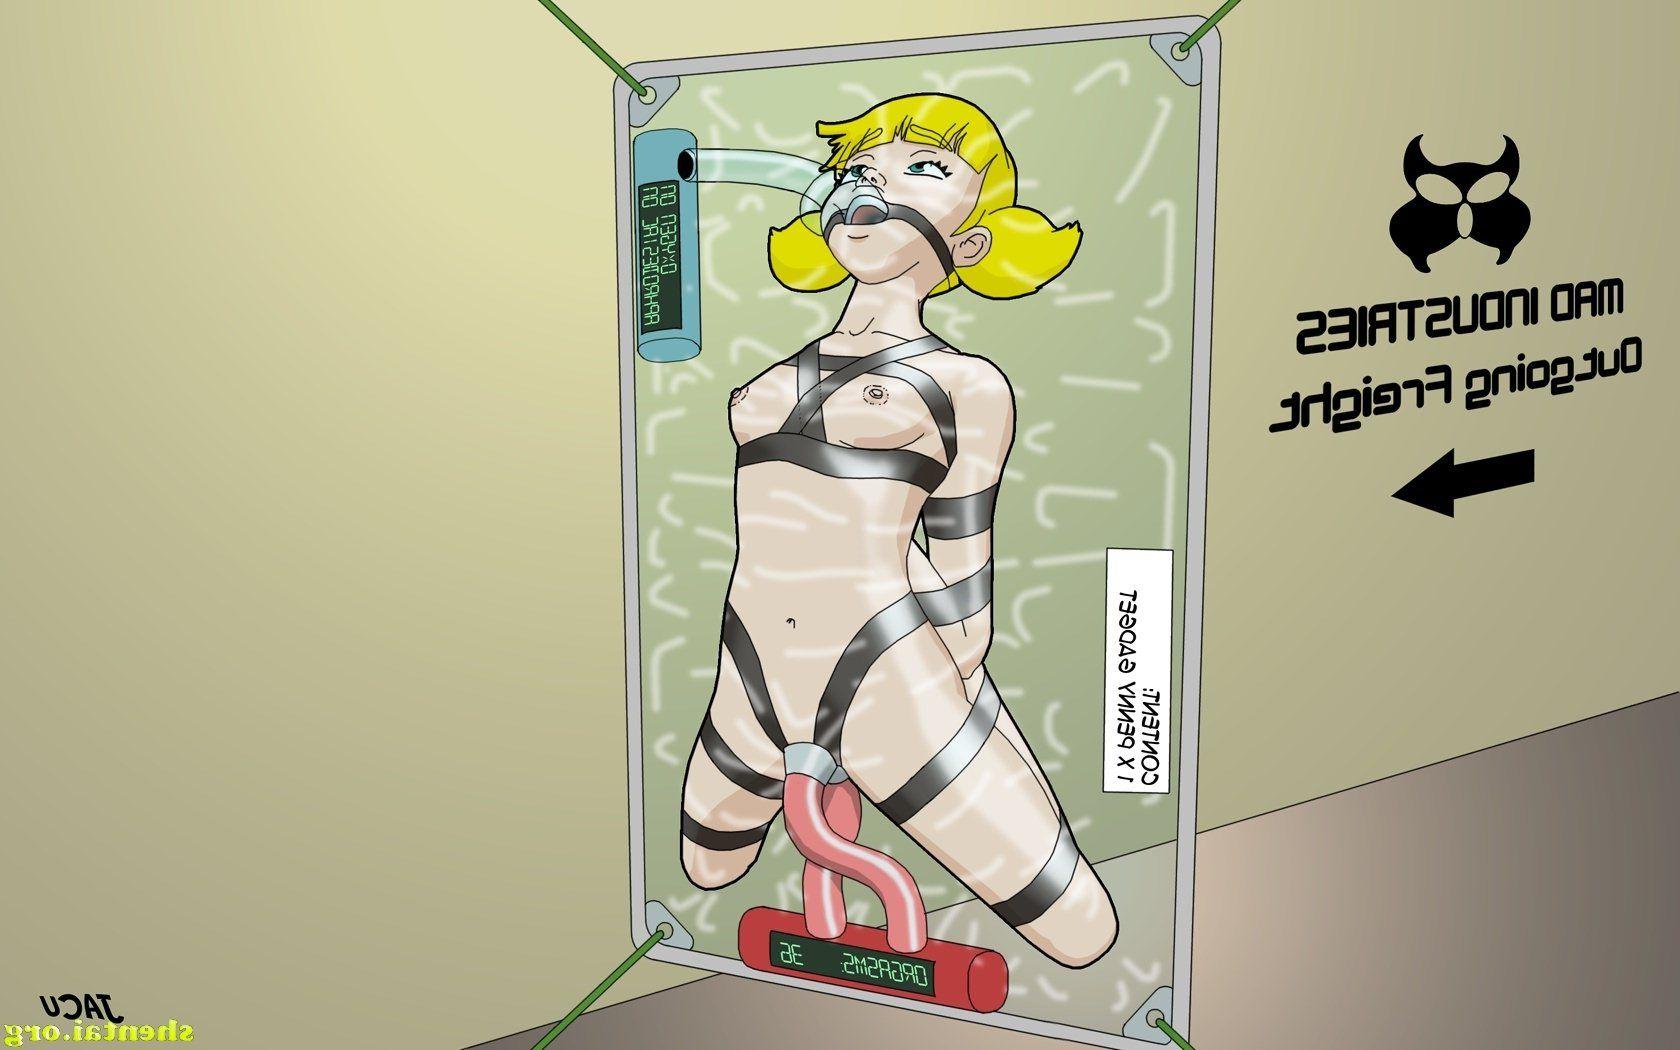 inspector-gadget-artwork image_2451.jpg